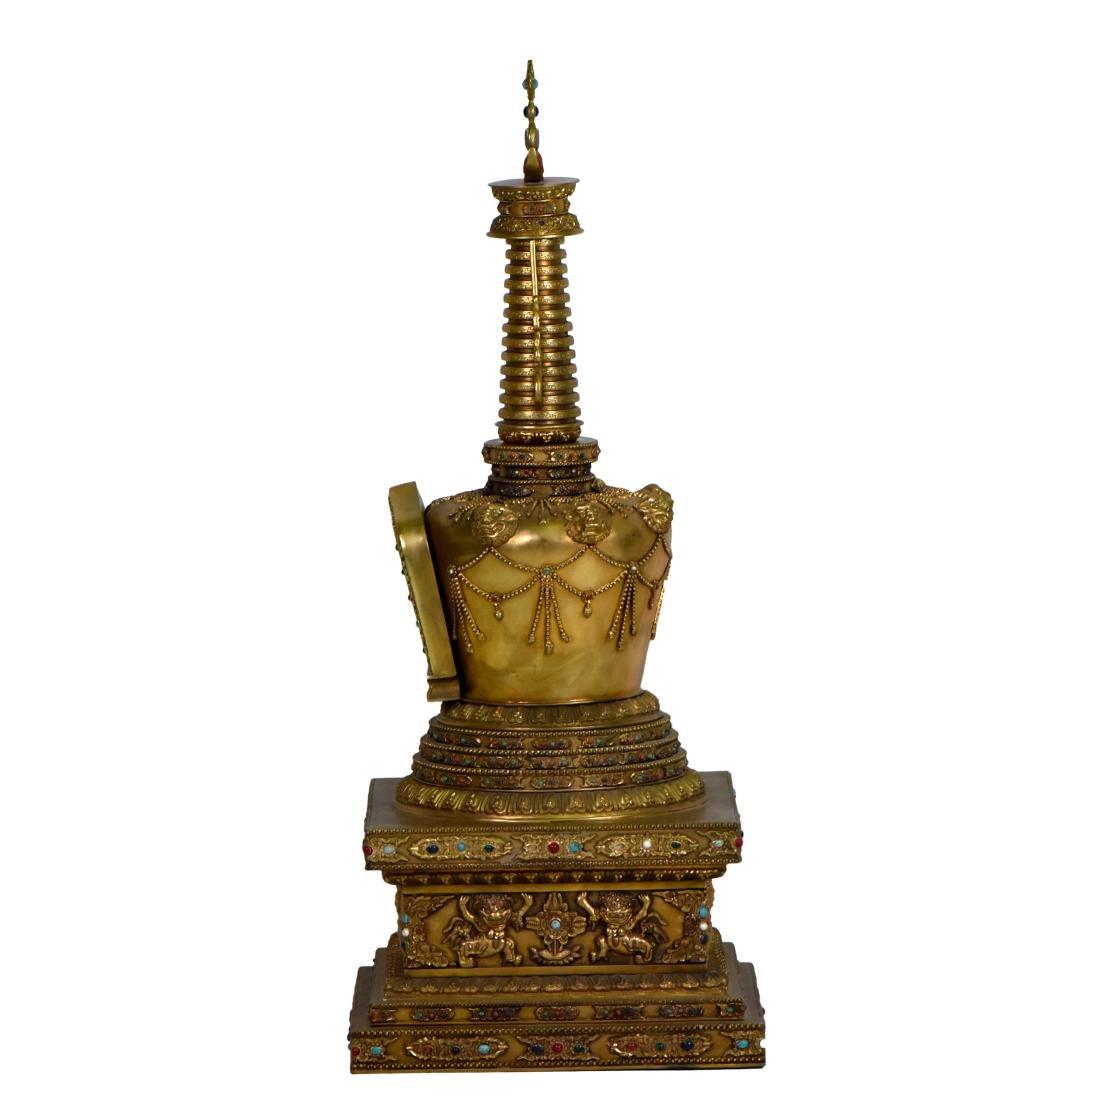 MASSIVE QING GILT BRONZE & STONES INLAID BUDDHA STUPA - 5